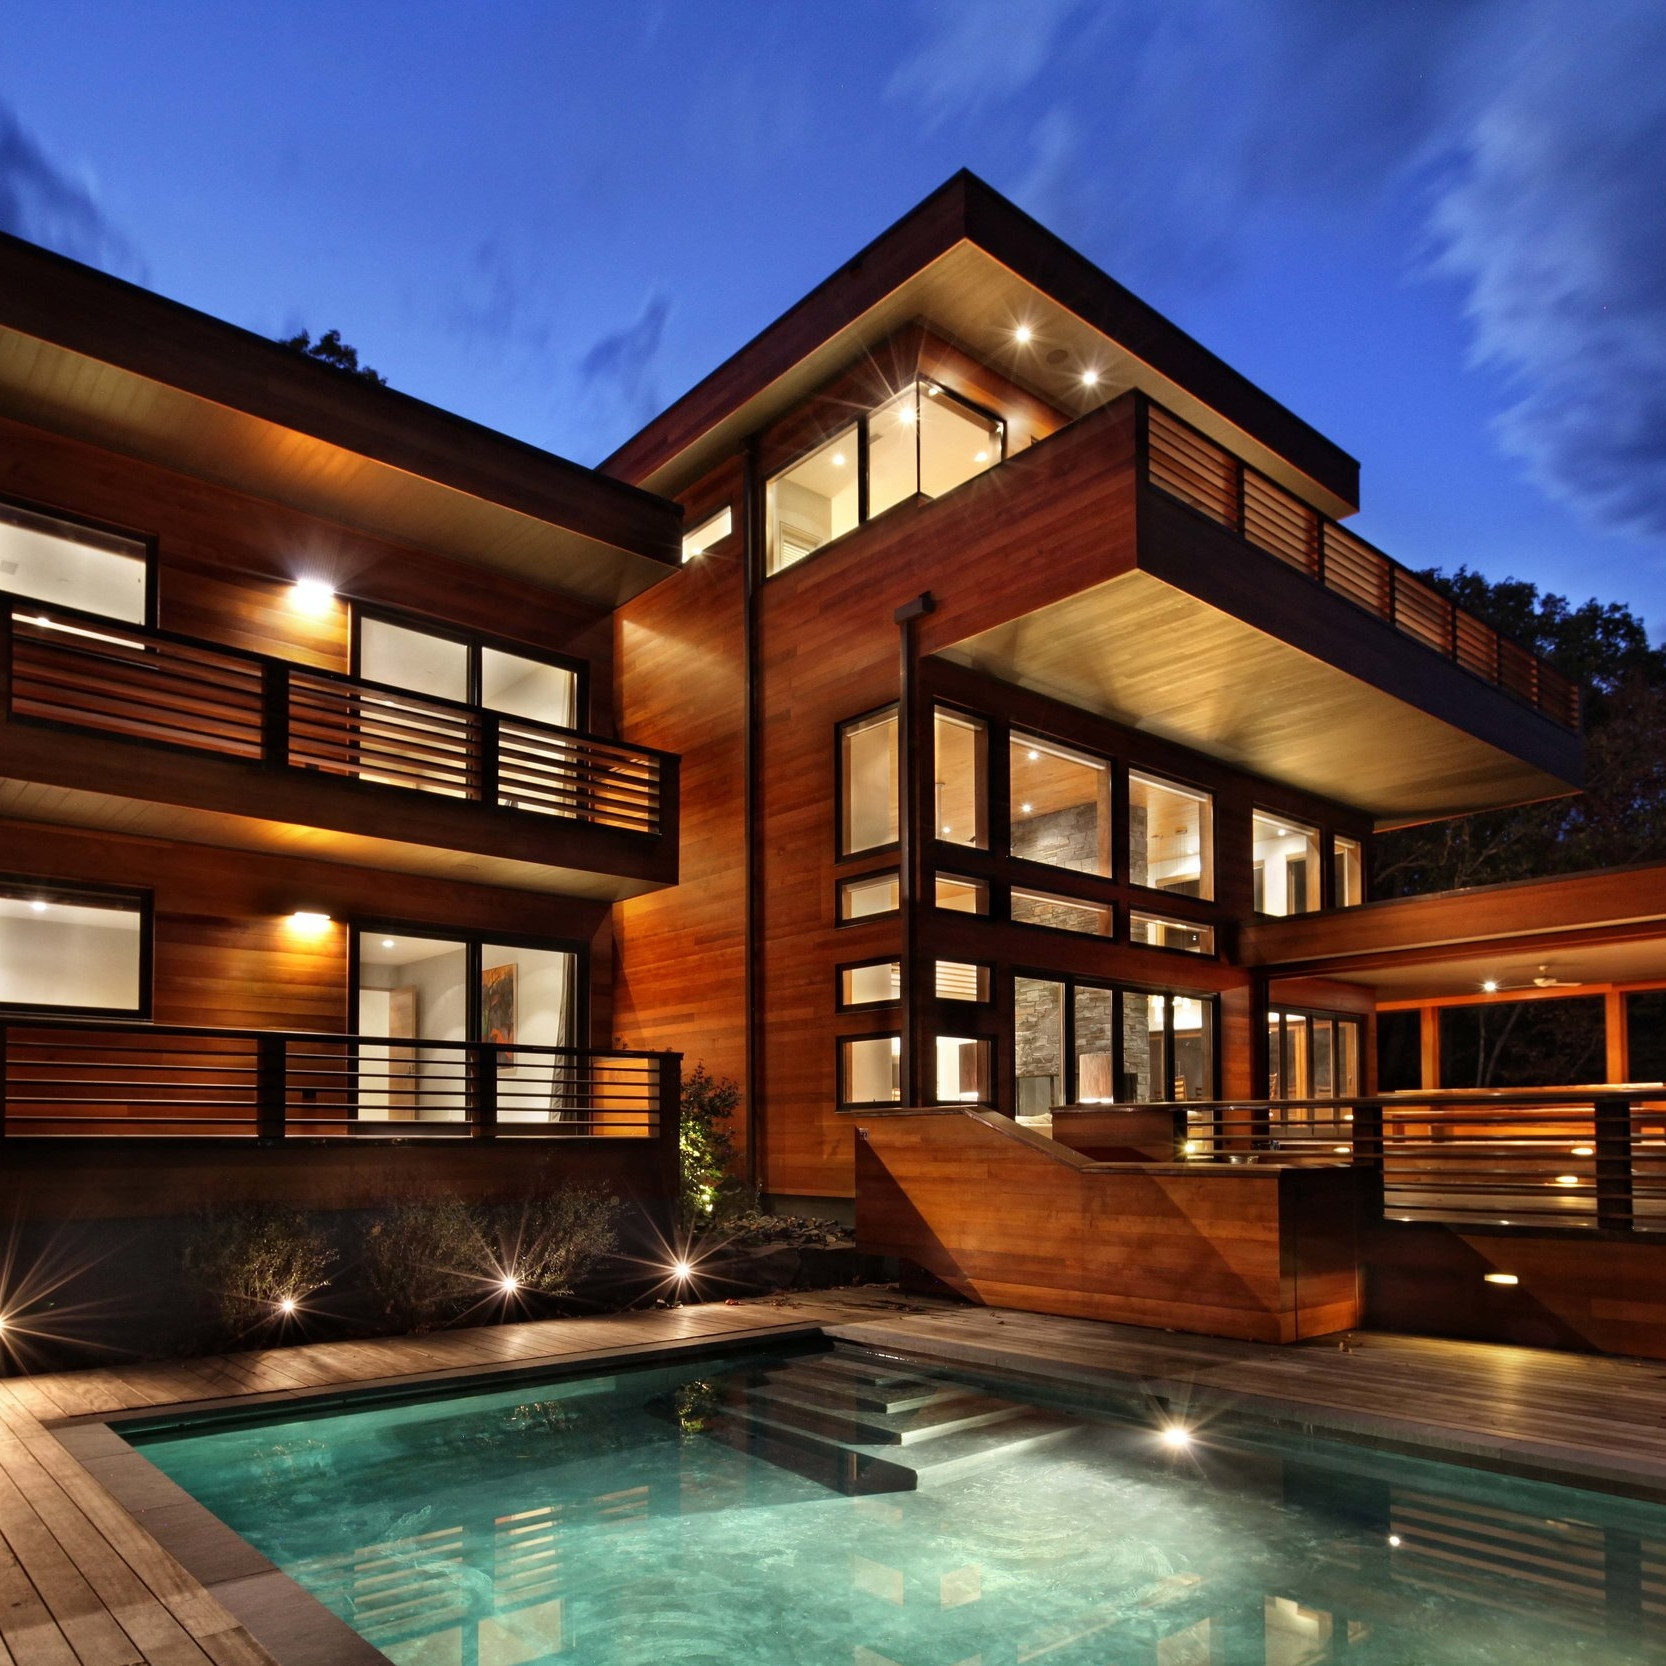 RiverBanks - Residential2013